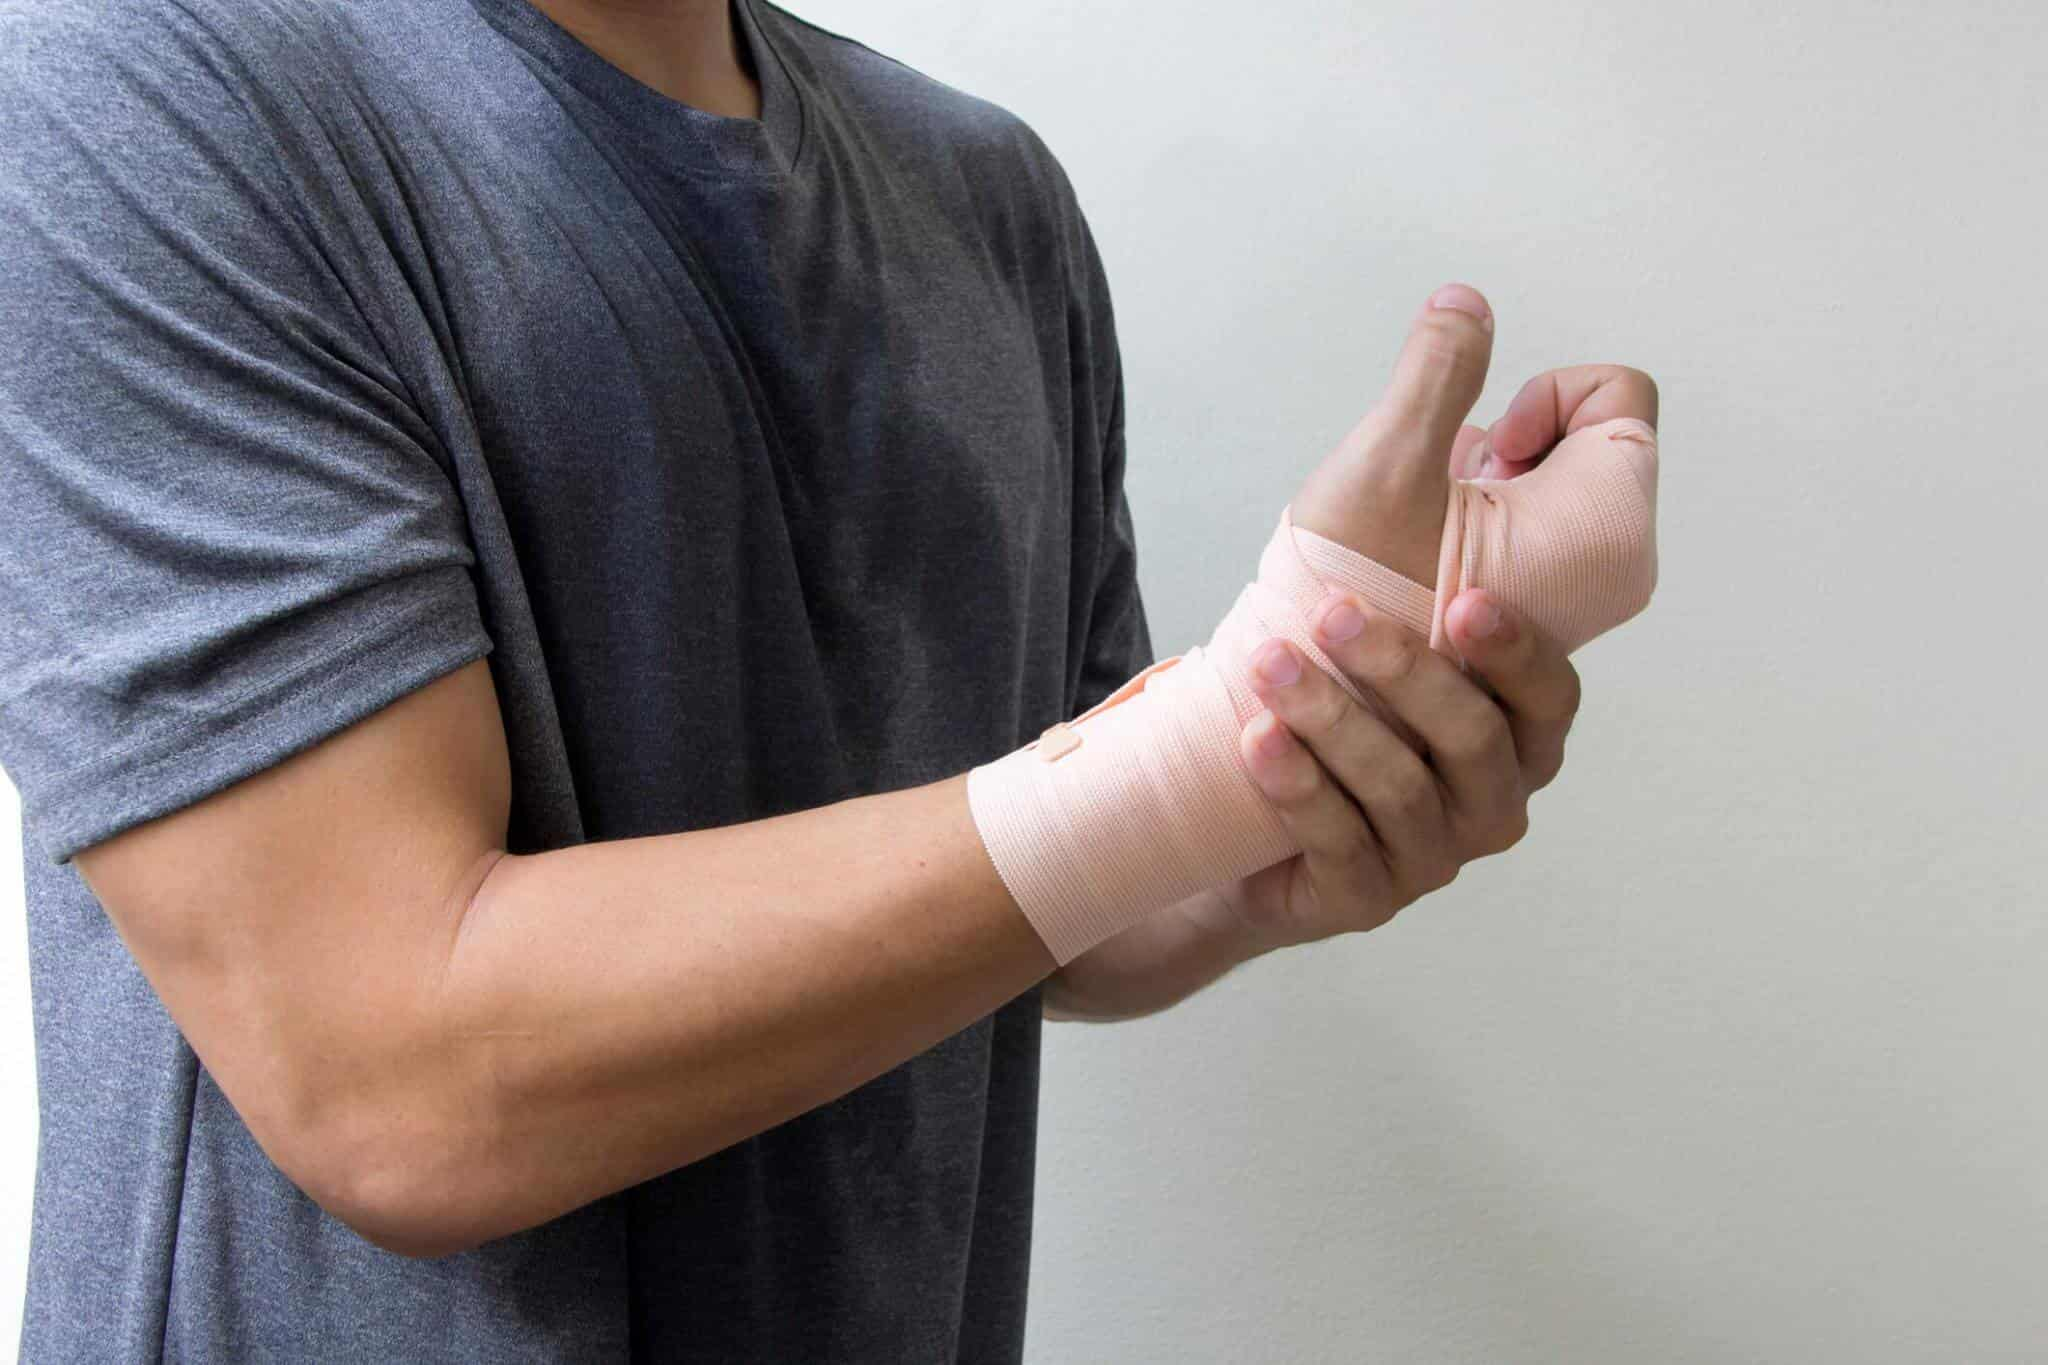 Man with Broken Wrist